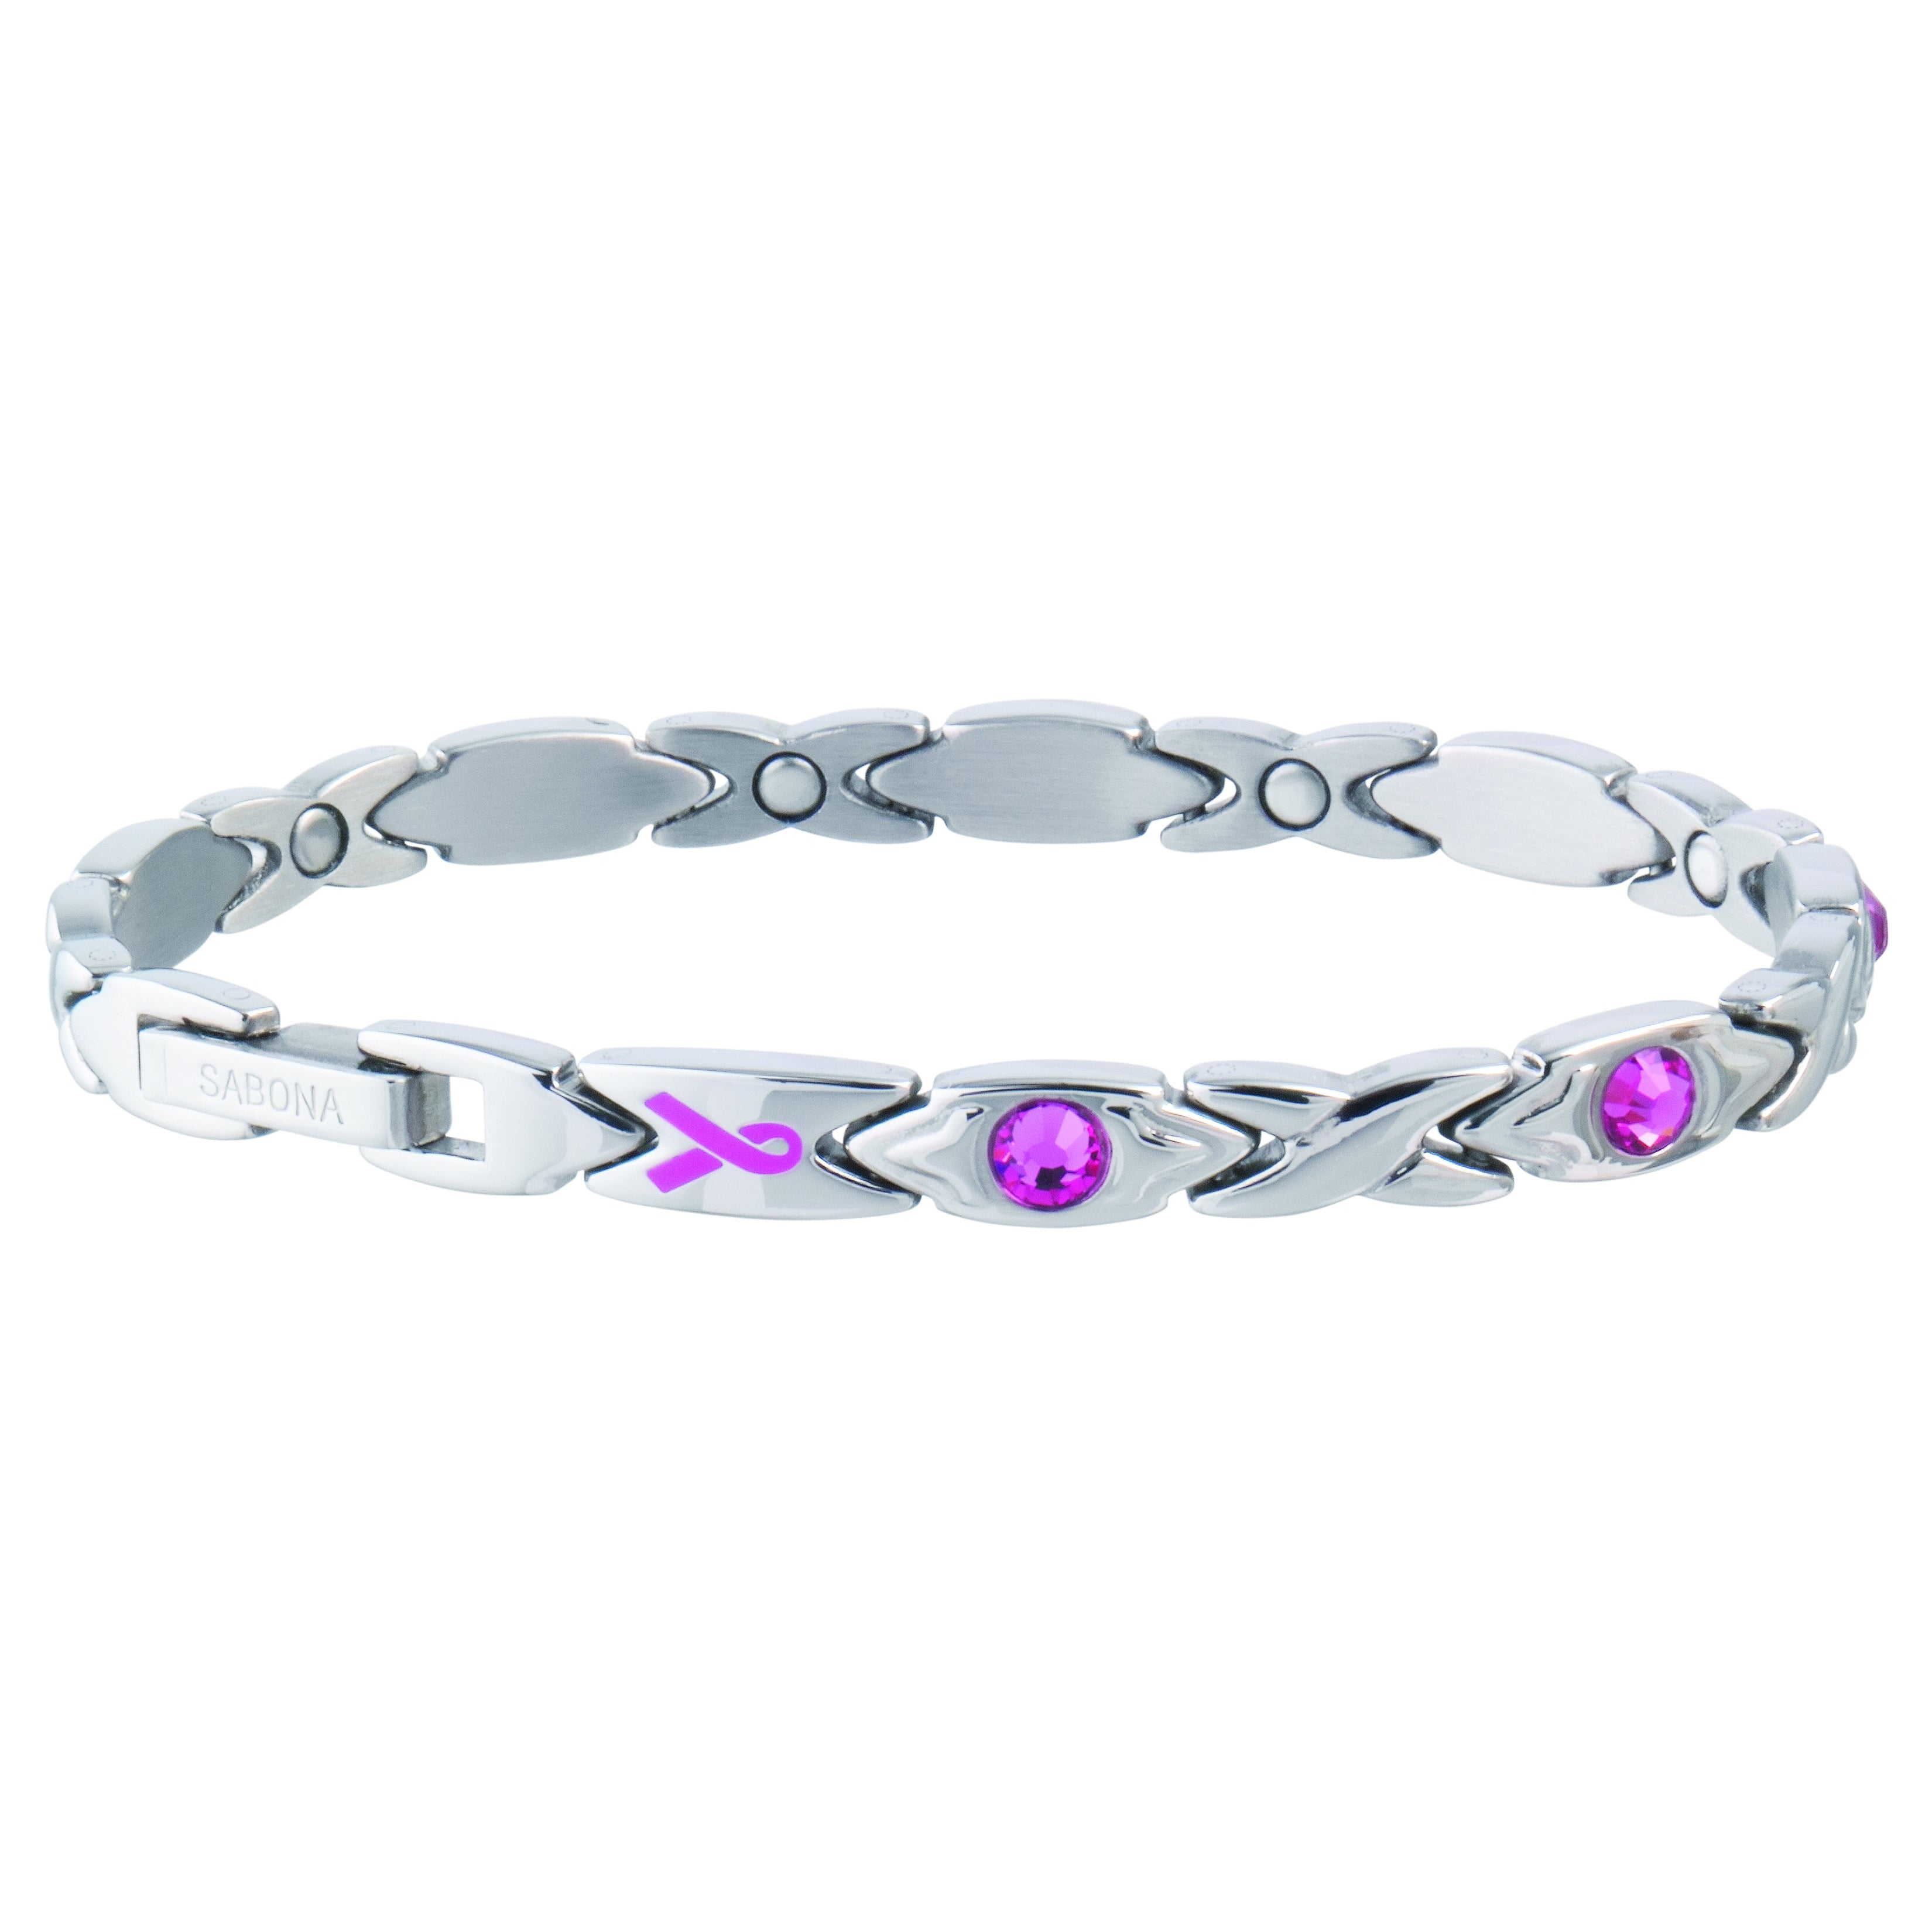 Sabona Courageous Pink Ribbon Magnetic Bracelet (Medium),...